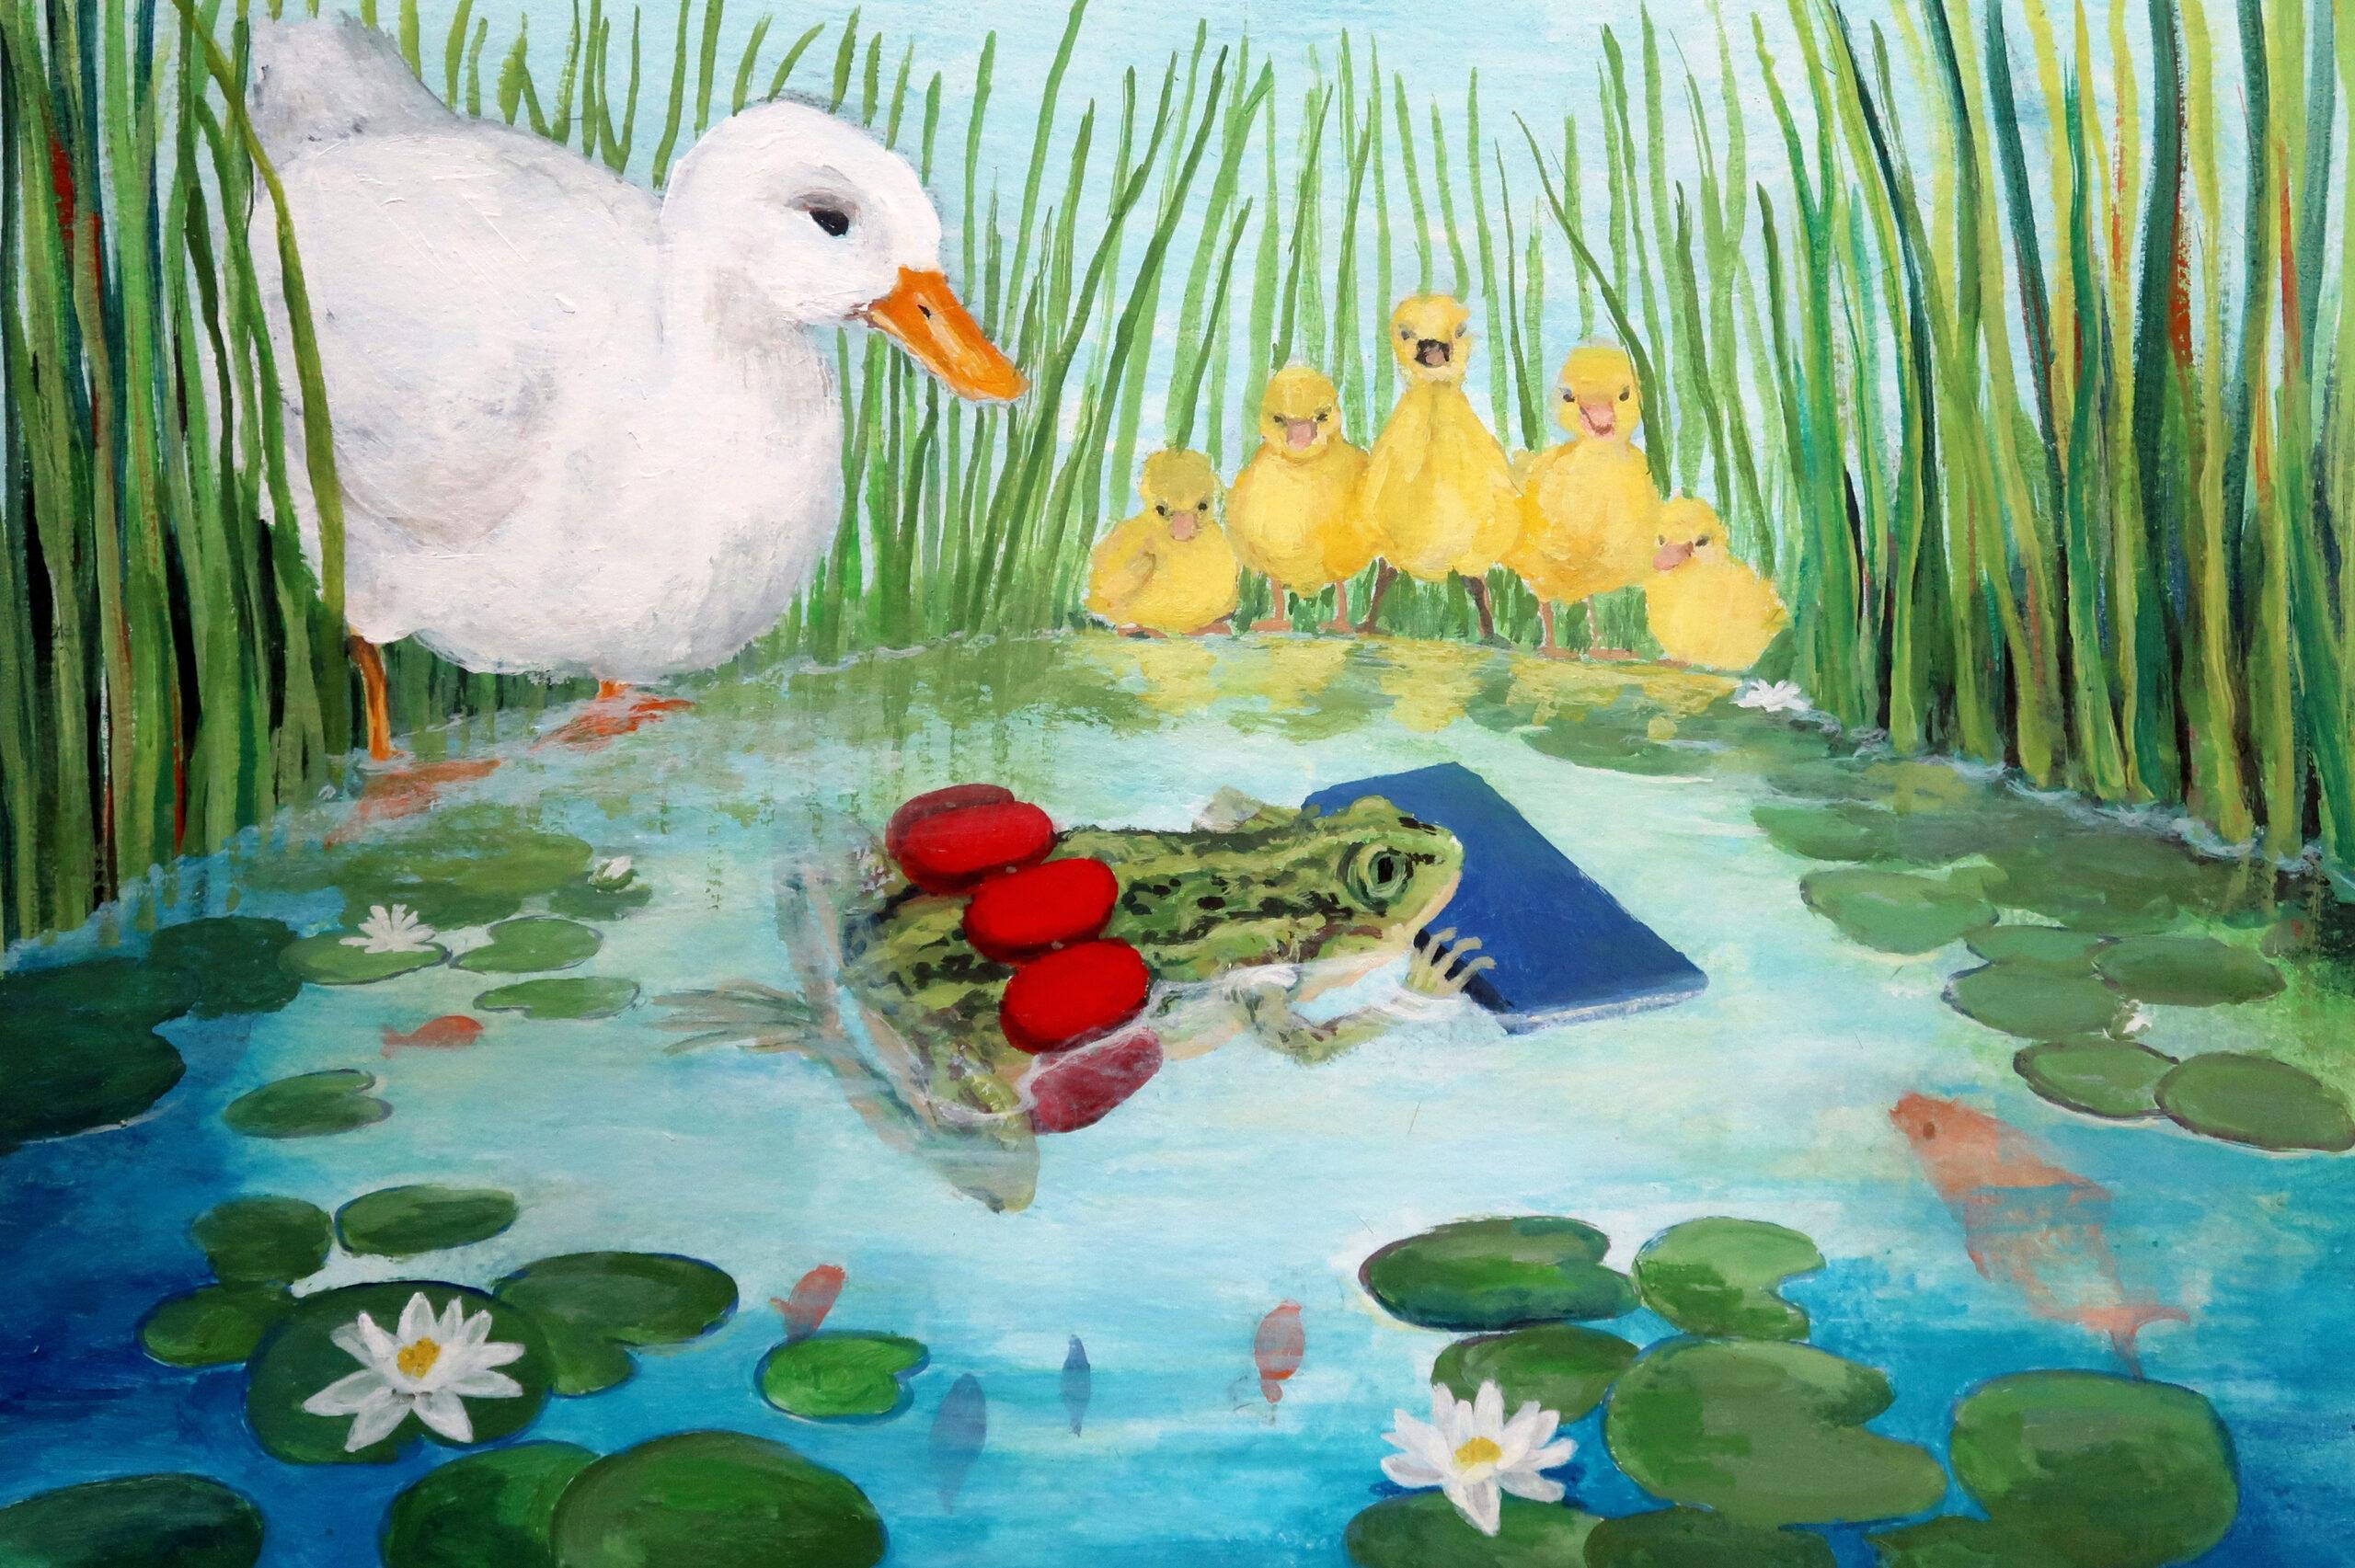 Kikker Kalle leert zwemmen - Stichting Gorsselse Zwembaden Almen